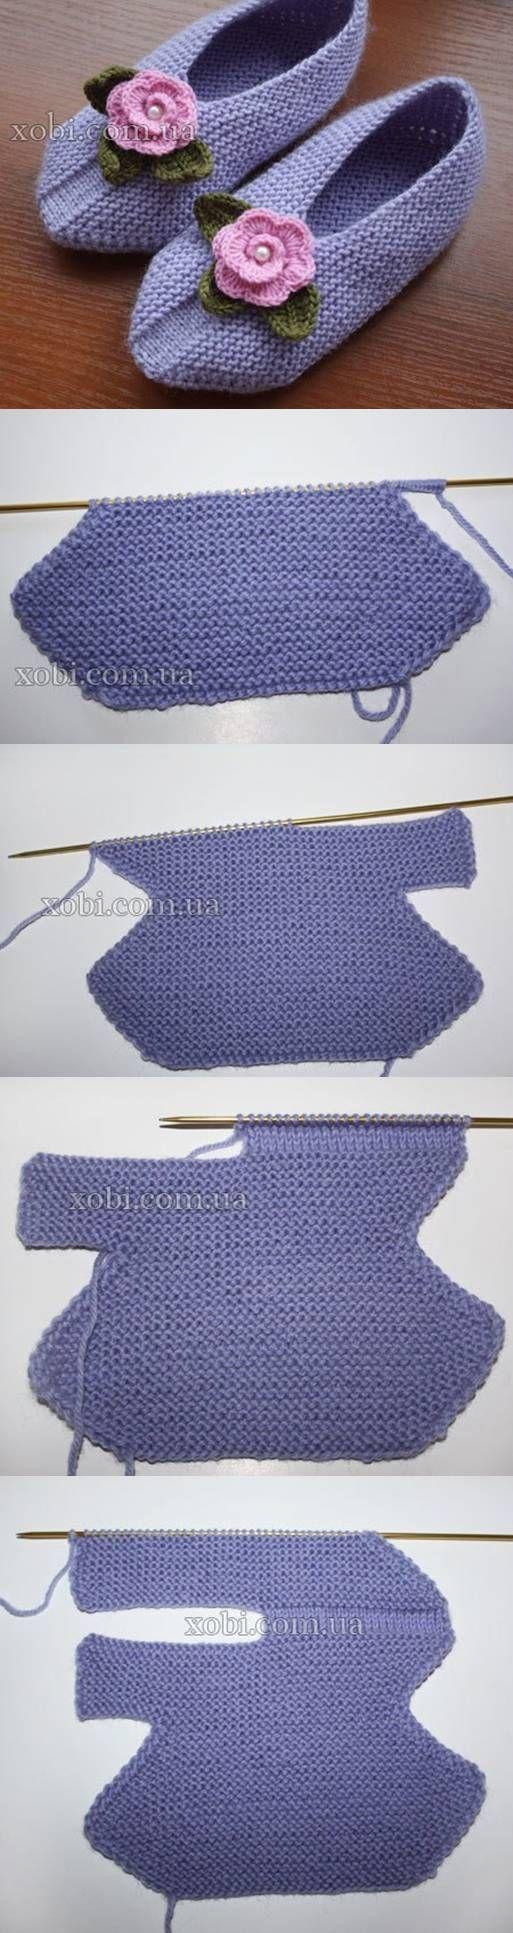 DIY Knitting Slippers DIY Knitting Slippers